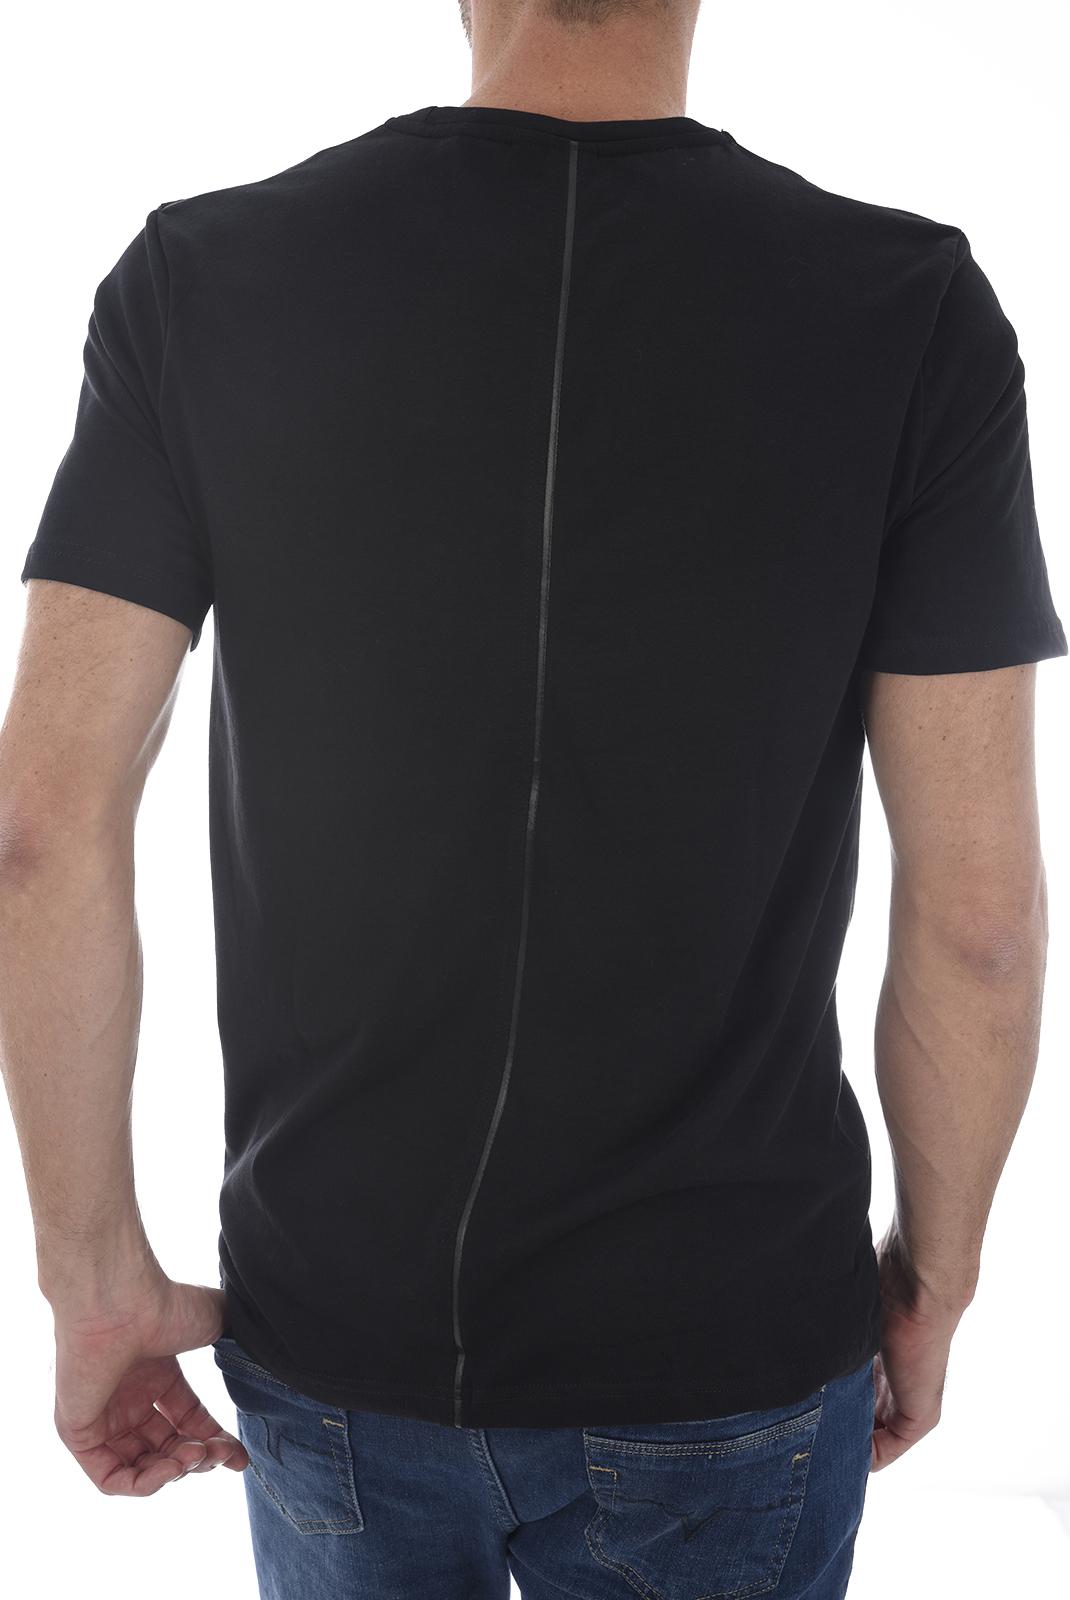 Tee-shirts  Kaporal SKULL H18M11 BLACK